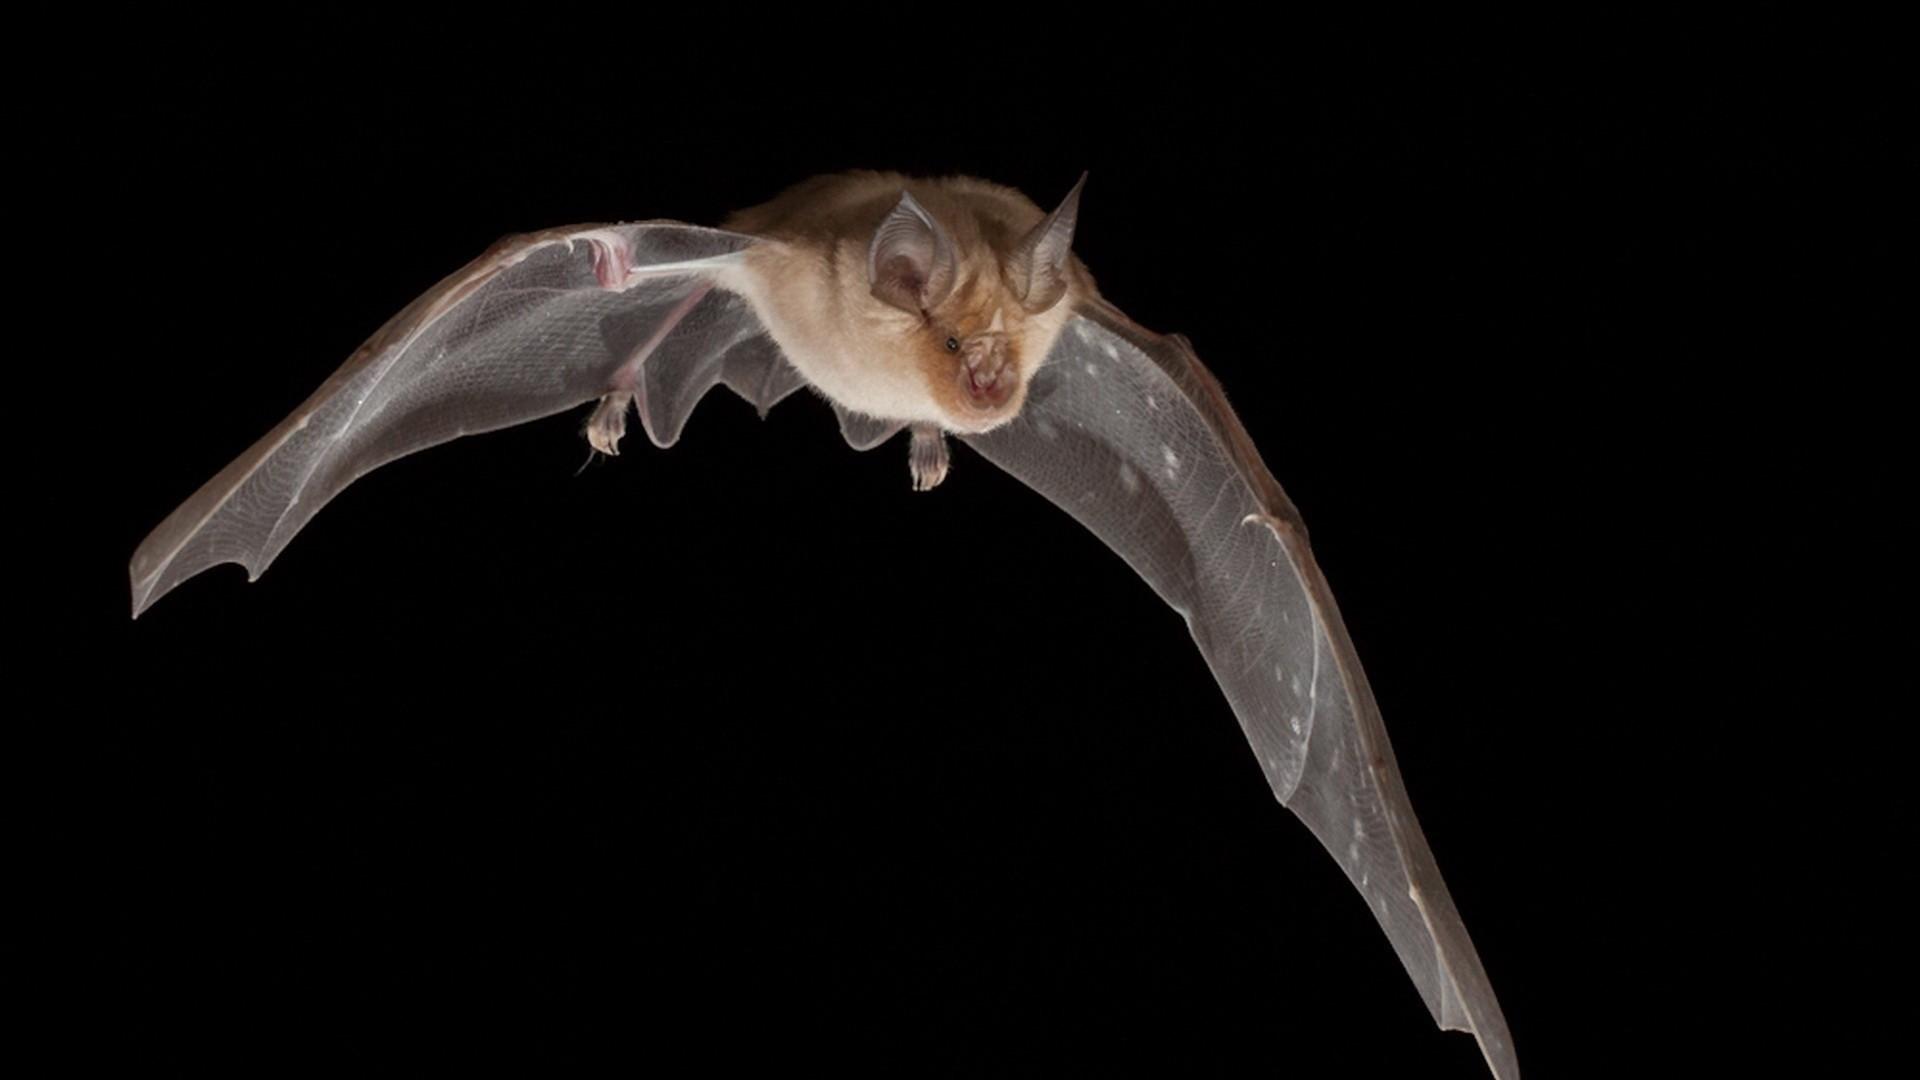 Bat Desktop wallpaper